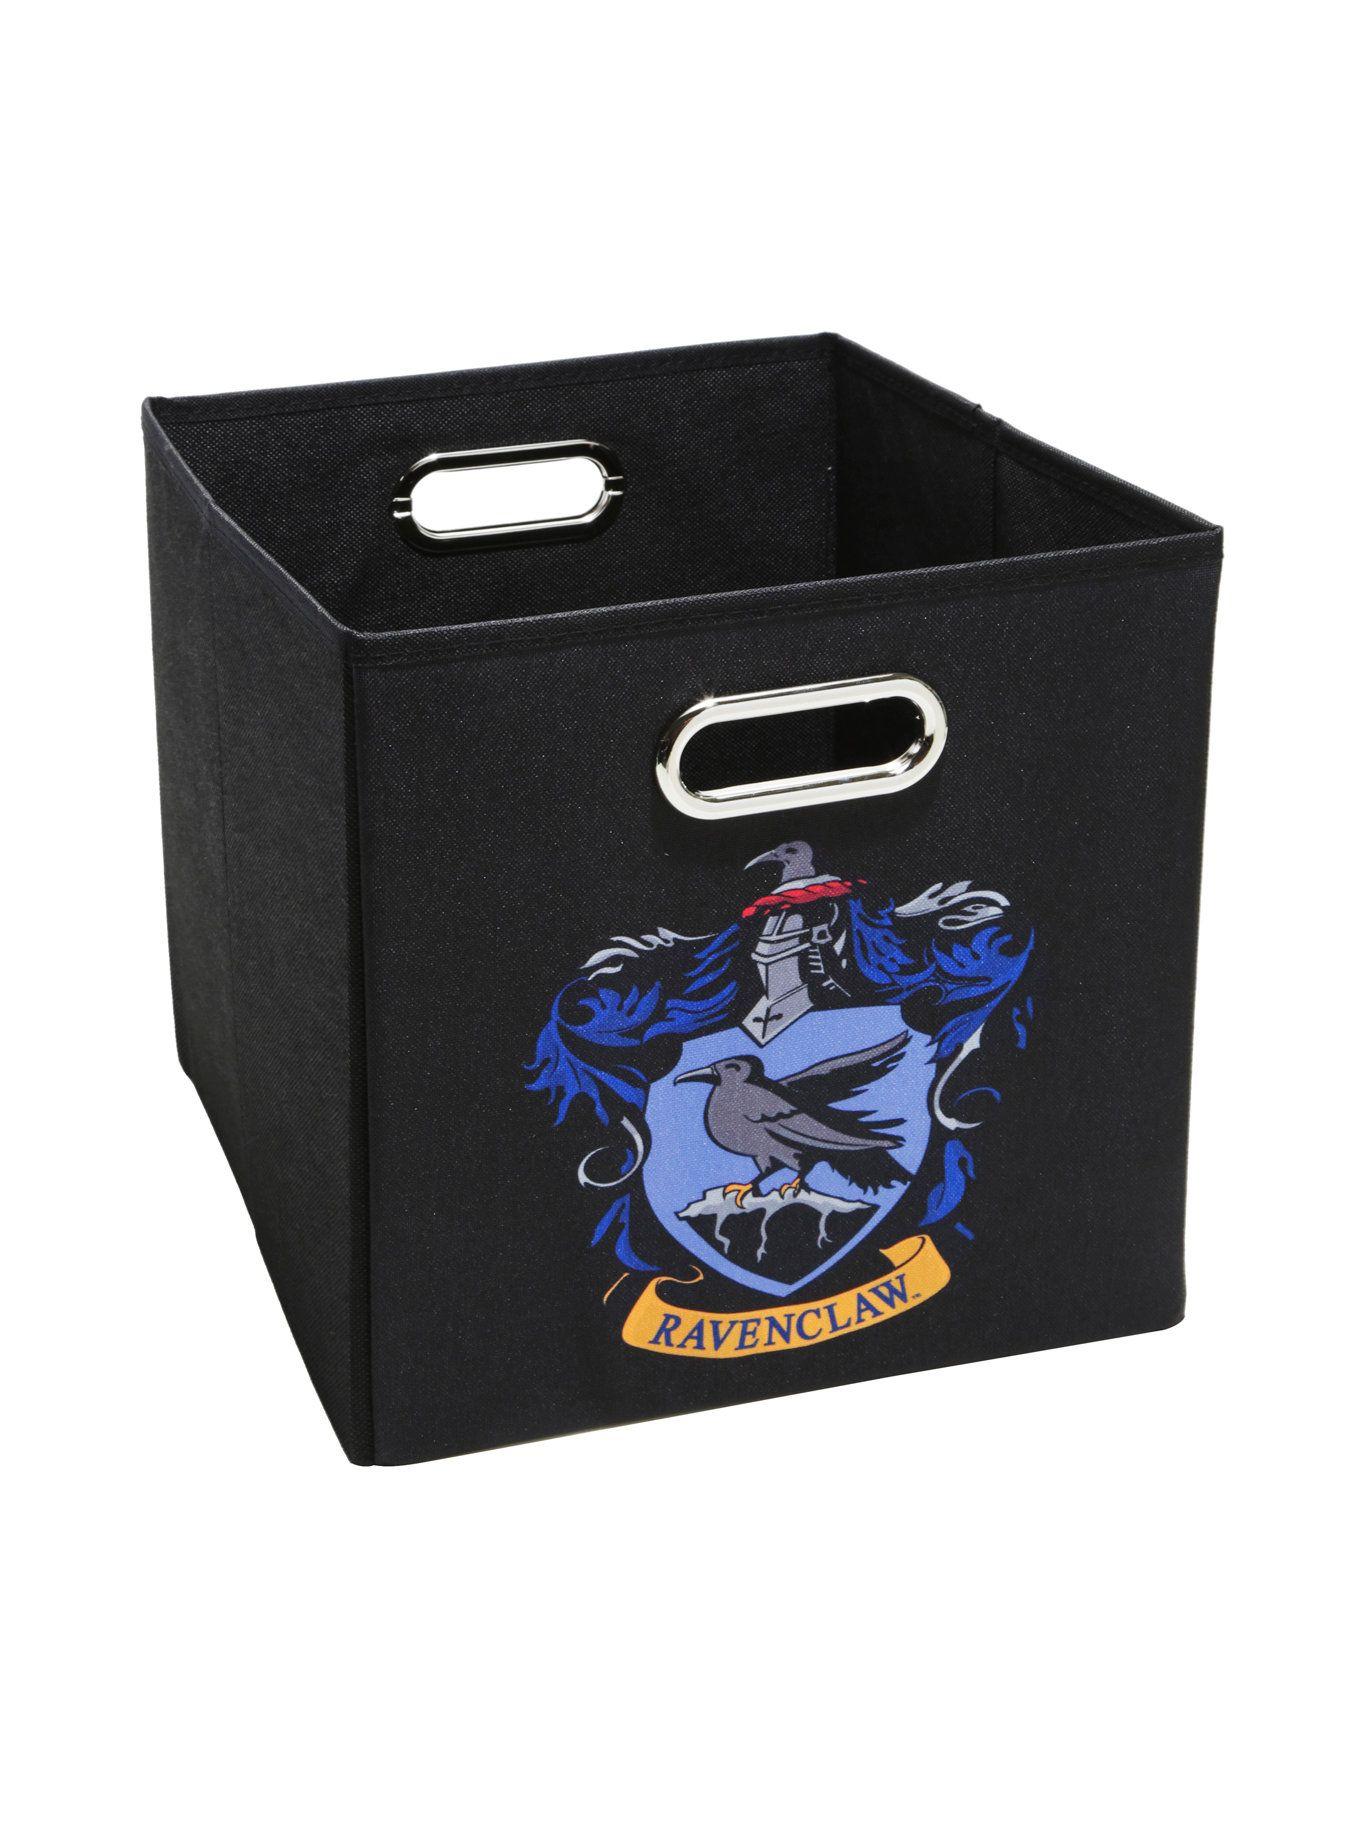 Harry Potter Ravenclaw Crest Small Storage Bin Harry Potter Ravenclaw Ravenclaw Harry Potter Logo